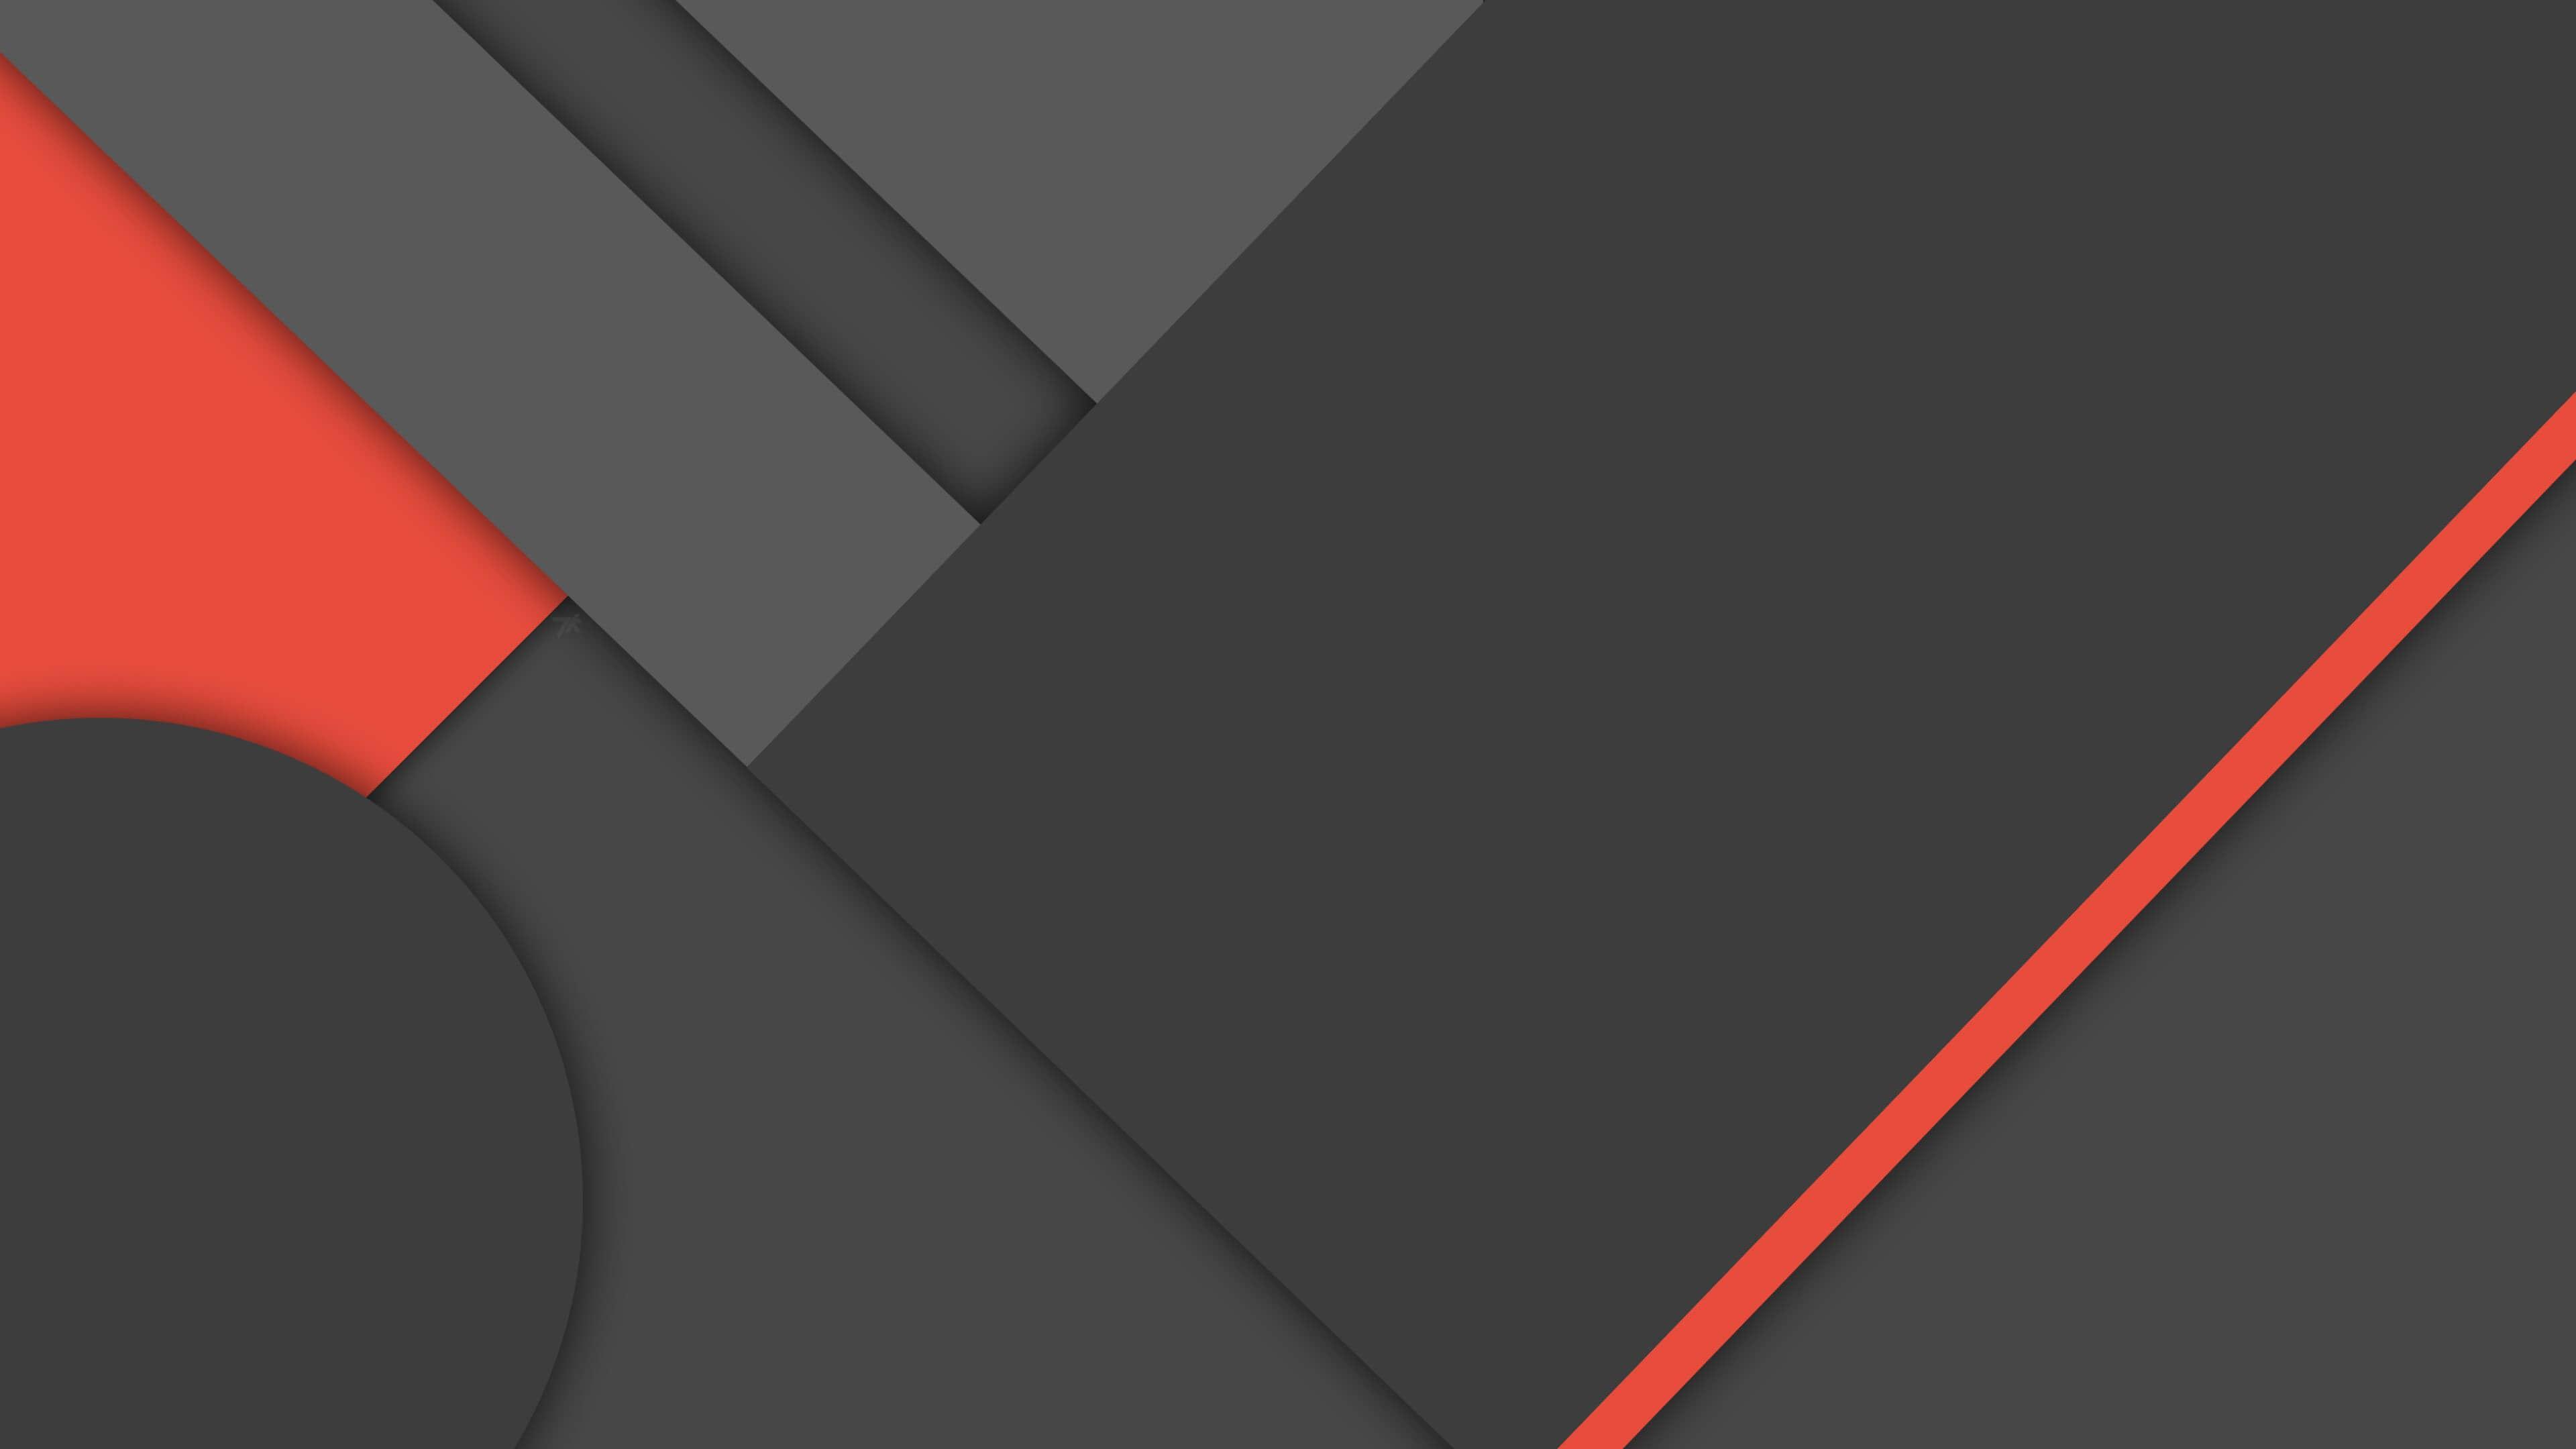 70 best free 4k red geforce wallpapers - wallpaperaccess